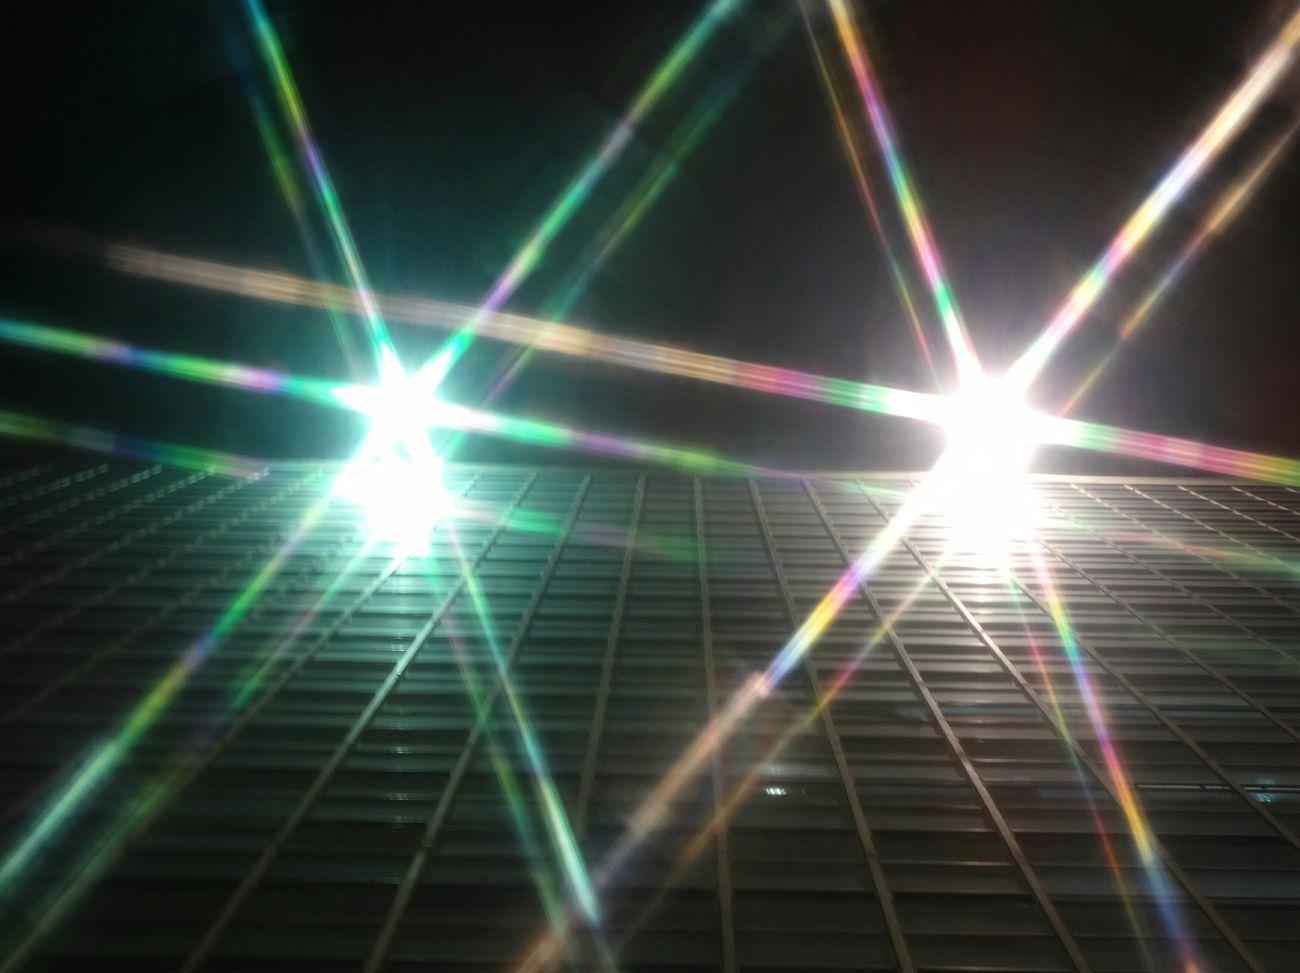 Star Filter Urban Urbanphotography